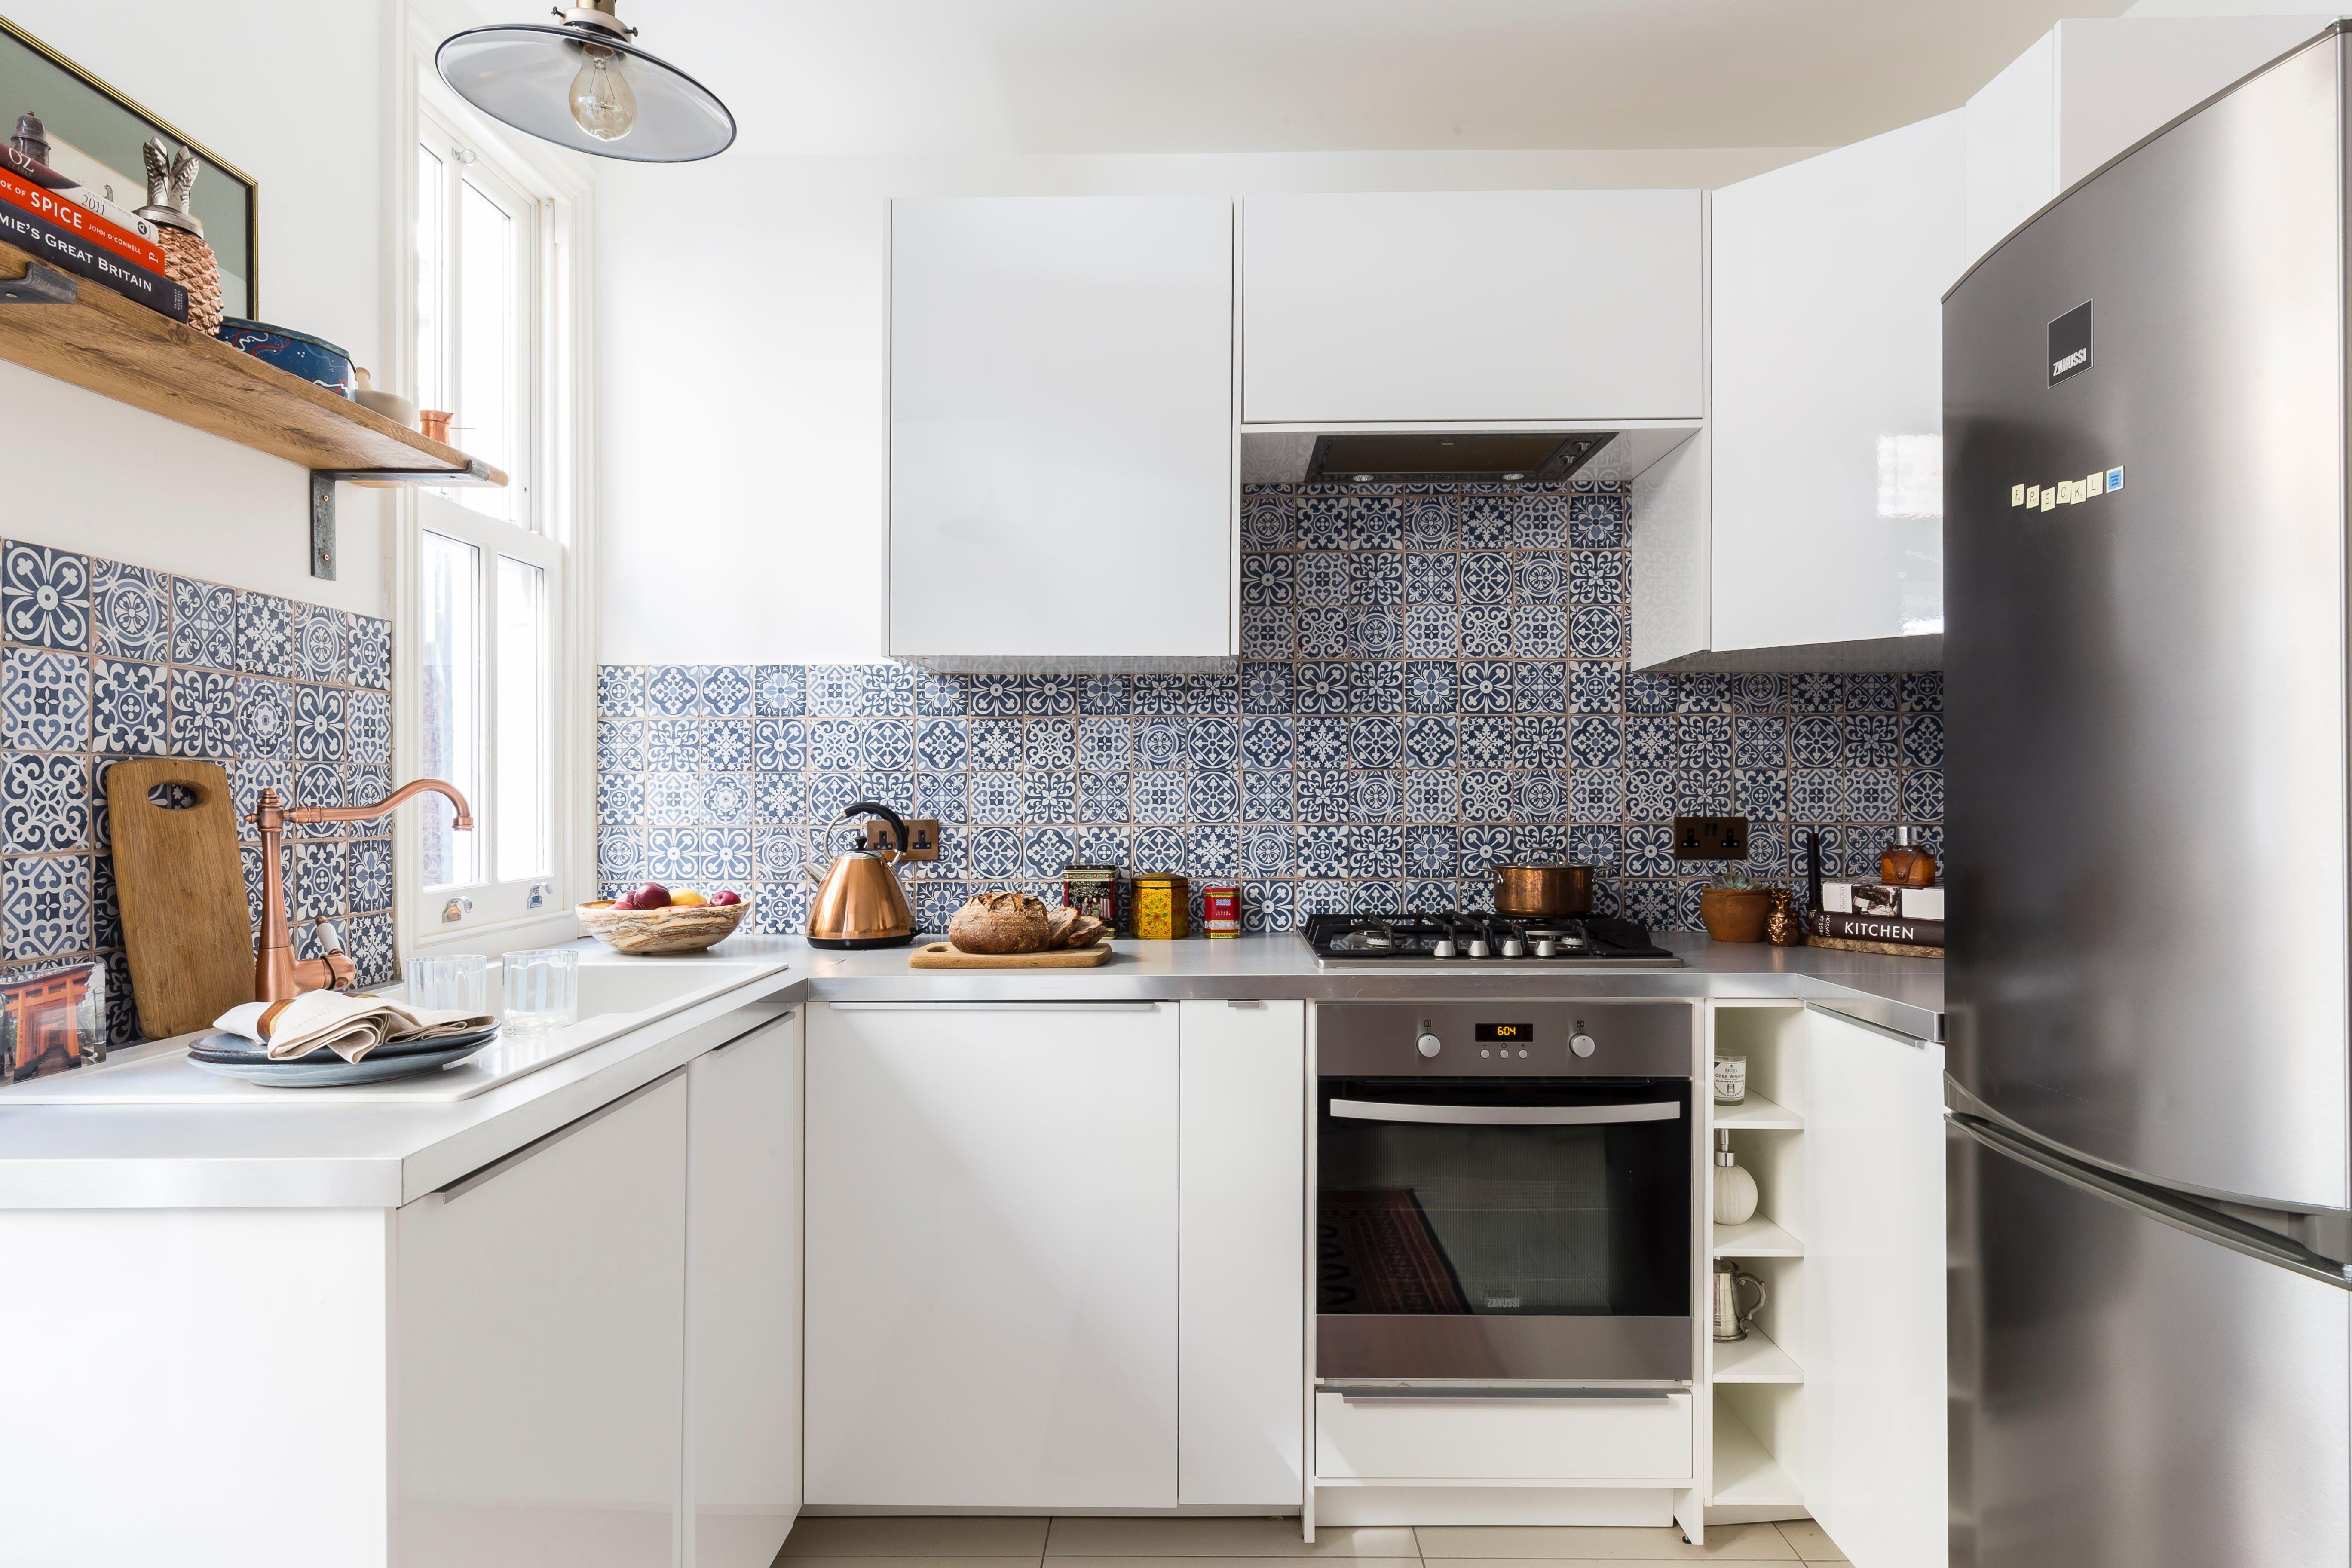 Tour a london interior designer s elegant eclectic flat kitchen